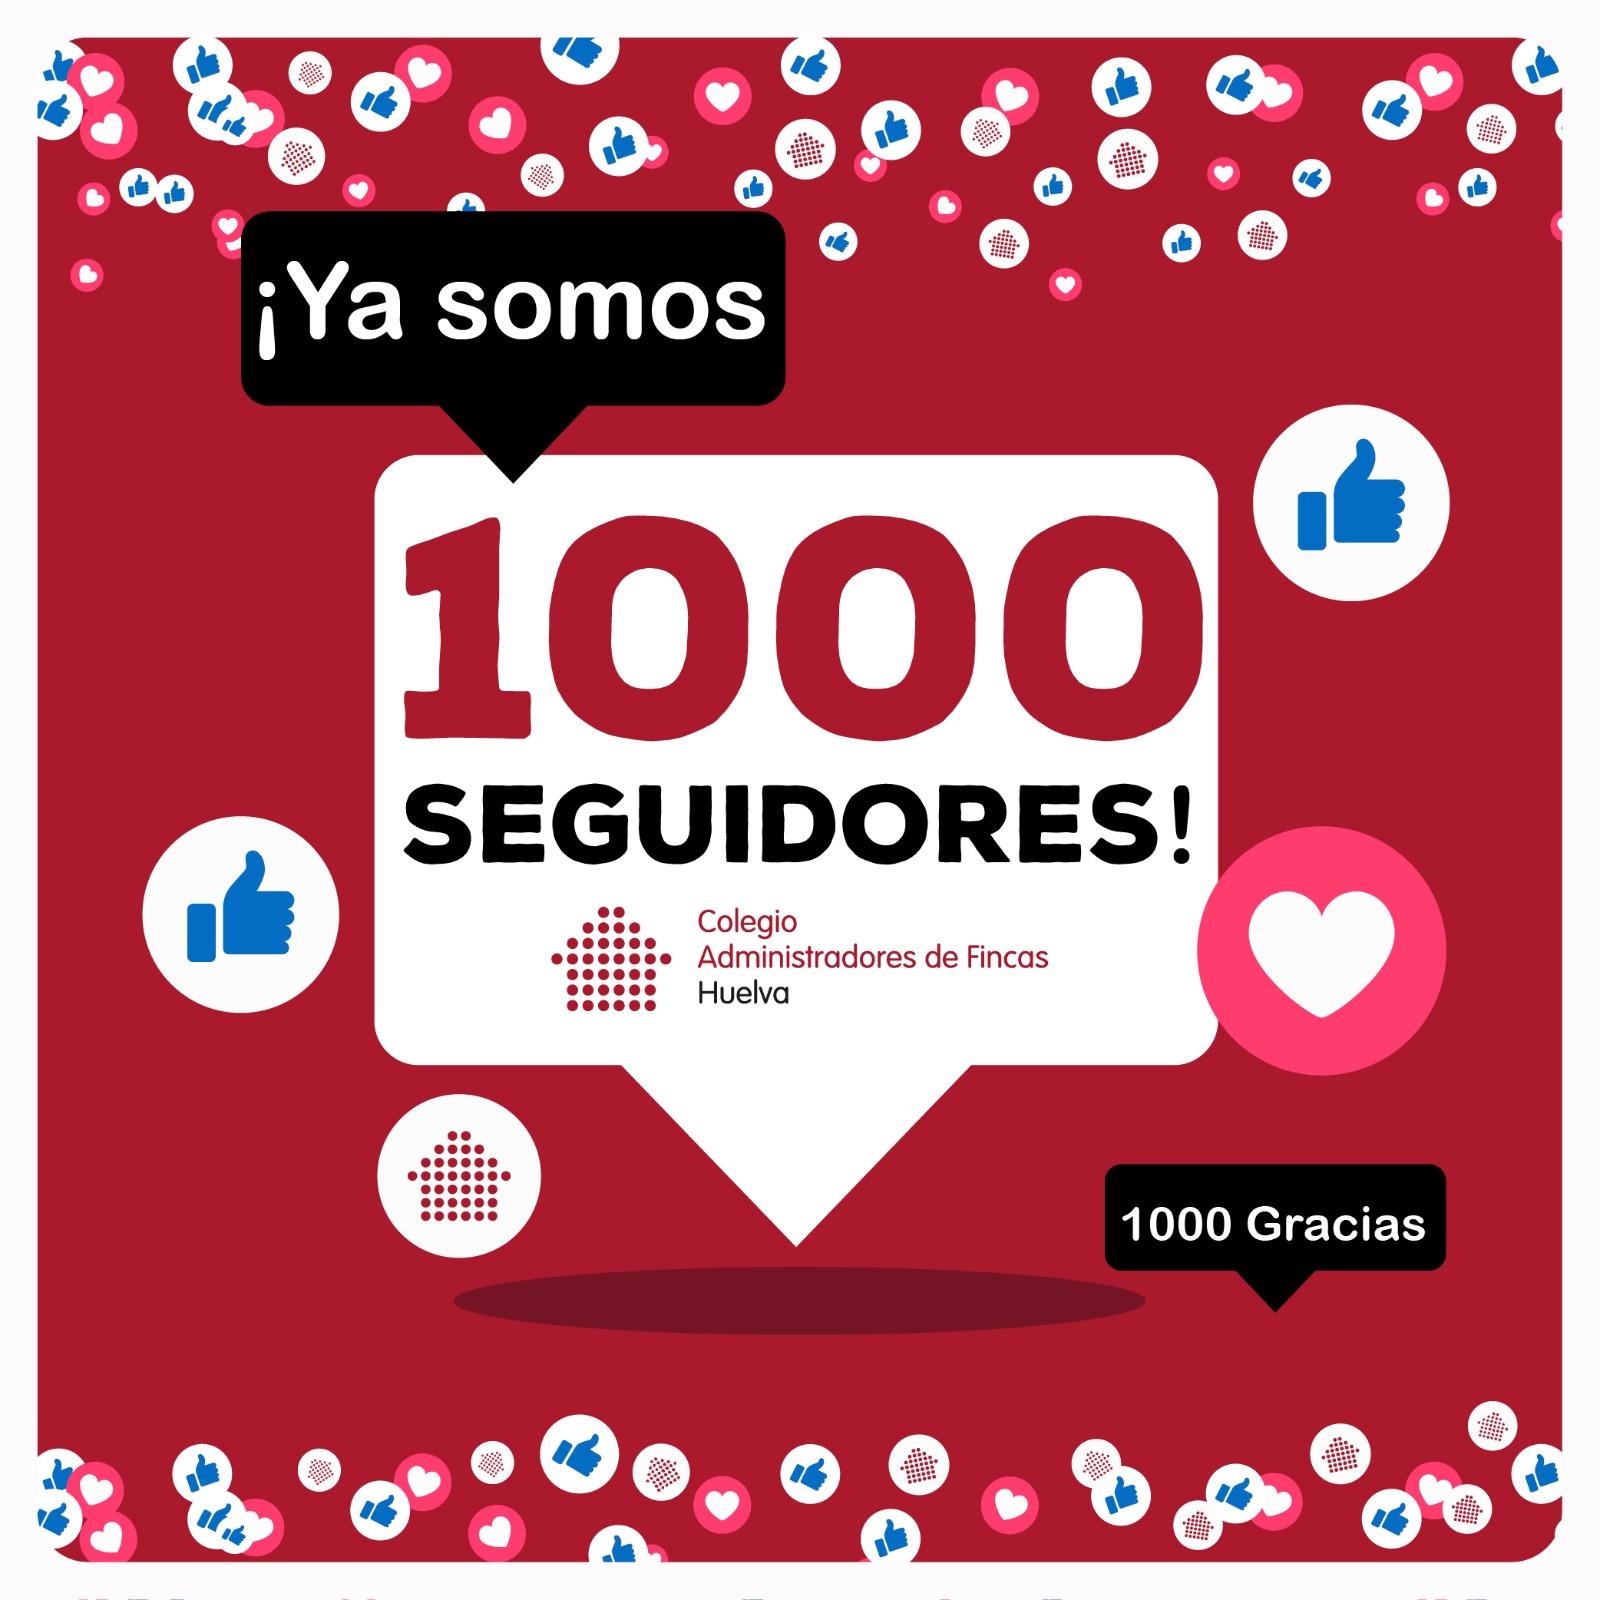 1000_Followers_ 2020-06-08_